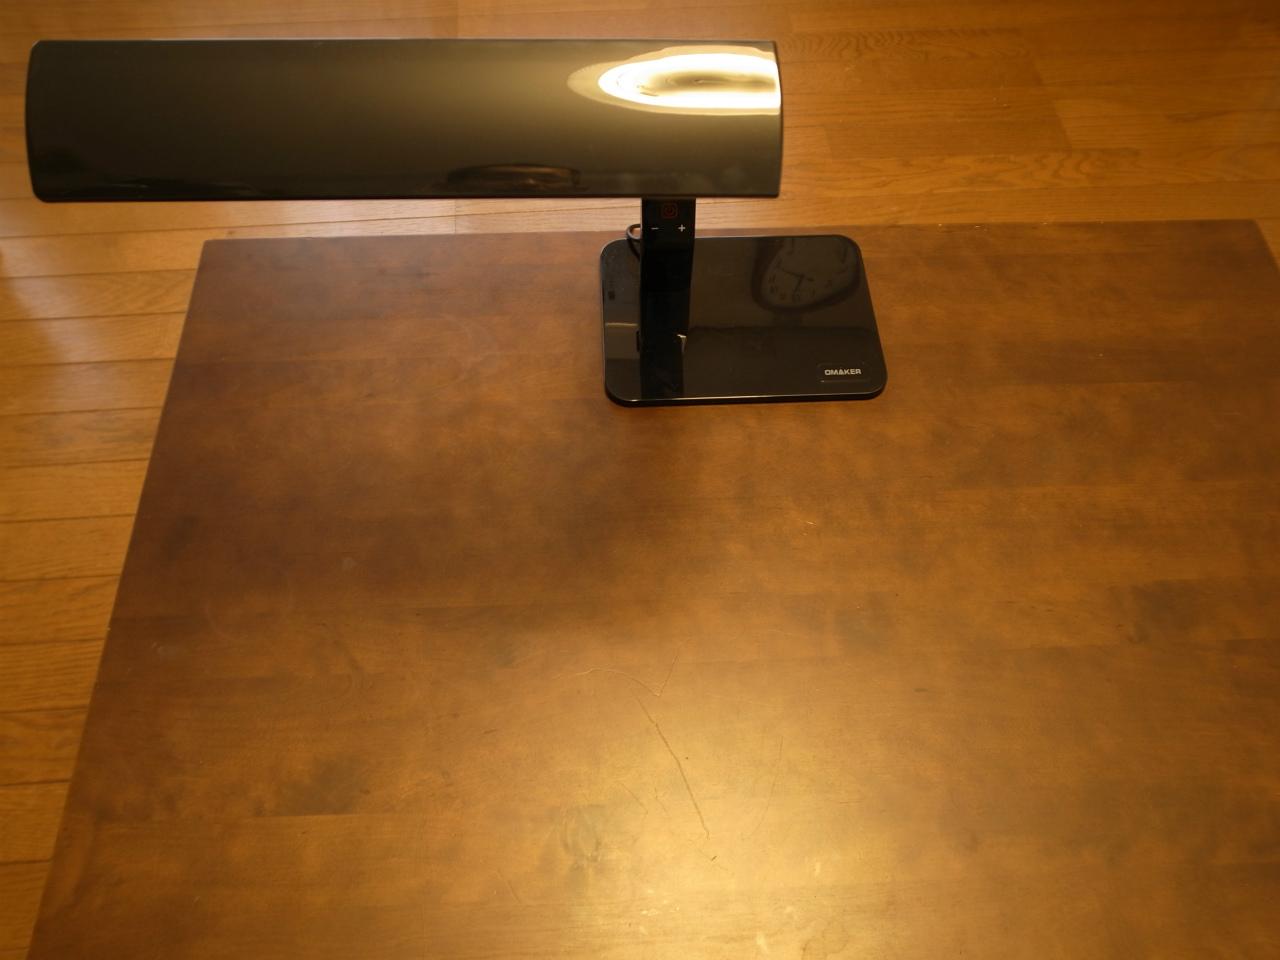 1201-201603_Omaker LED Desklight 16